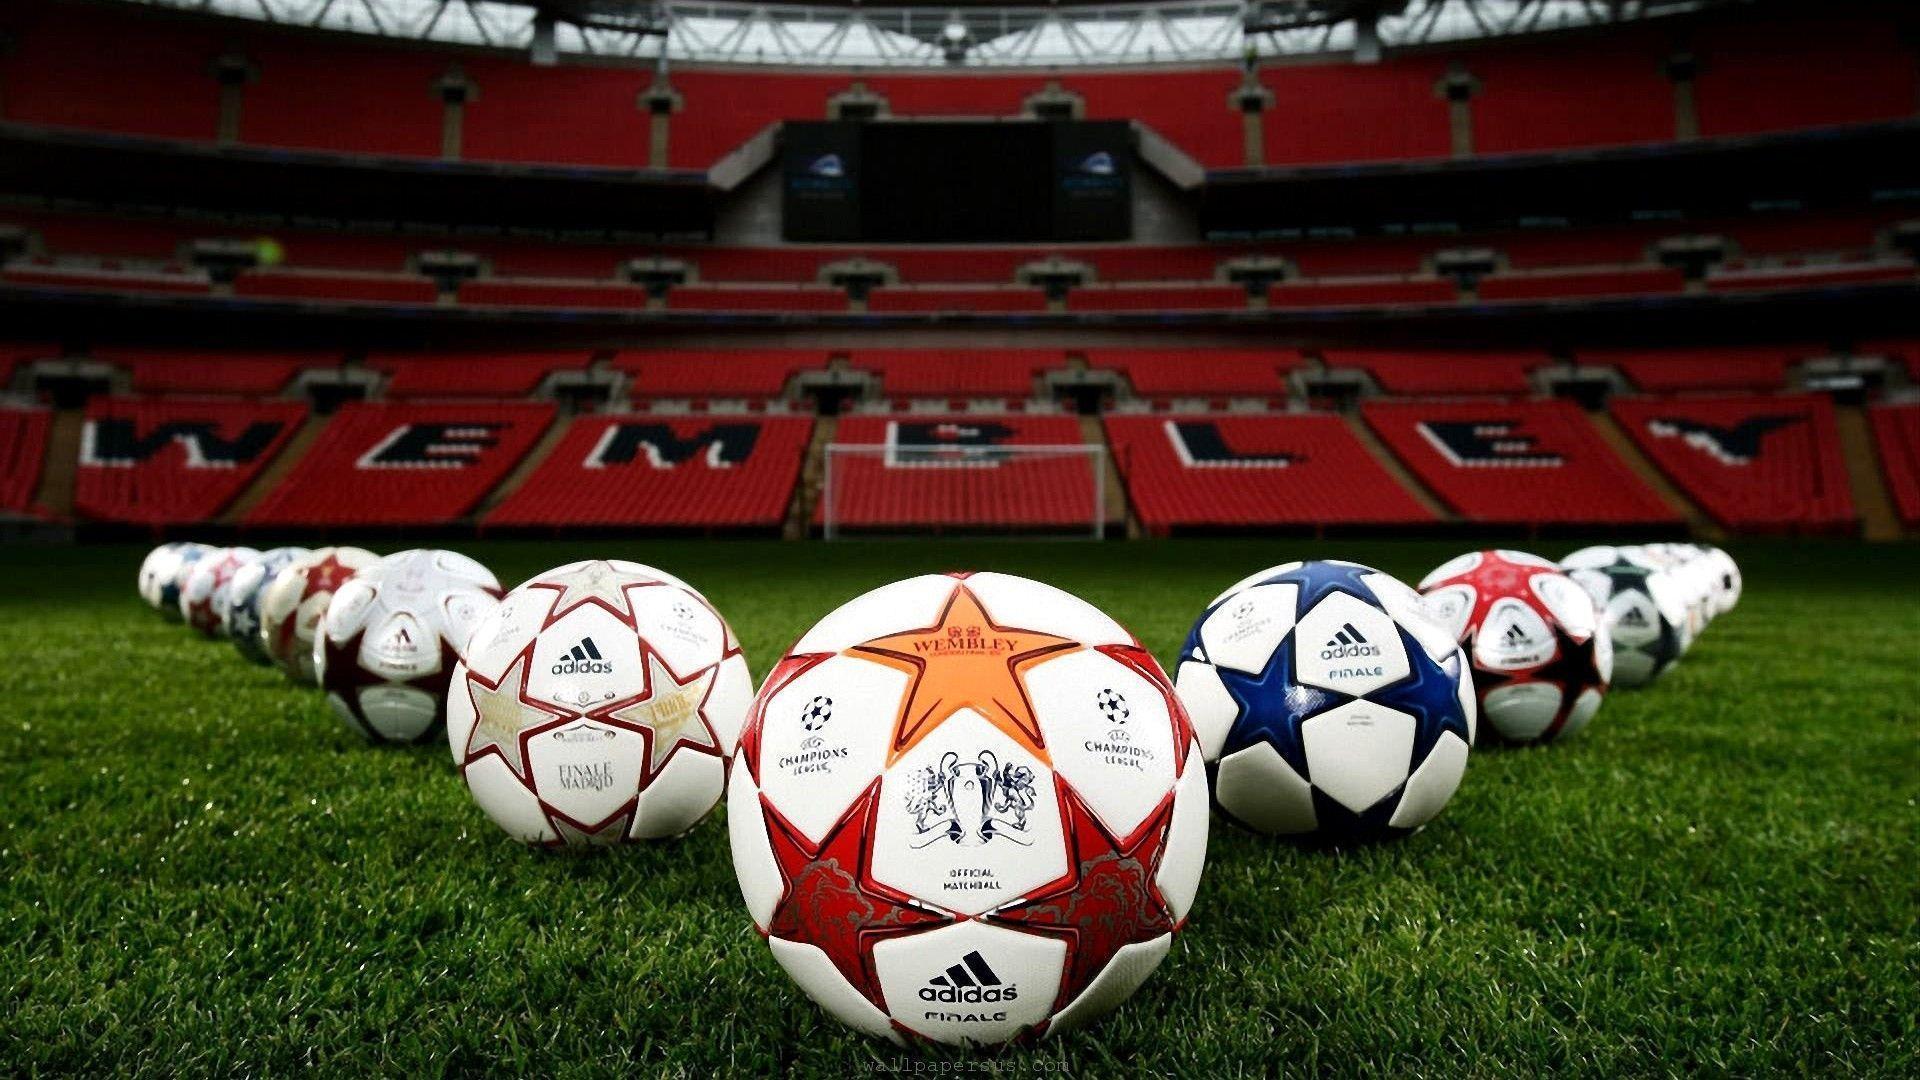 UEFA Champions League Ball (2013) HD Wallpaper | Crazy Themes